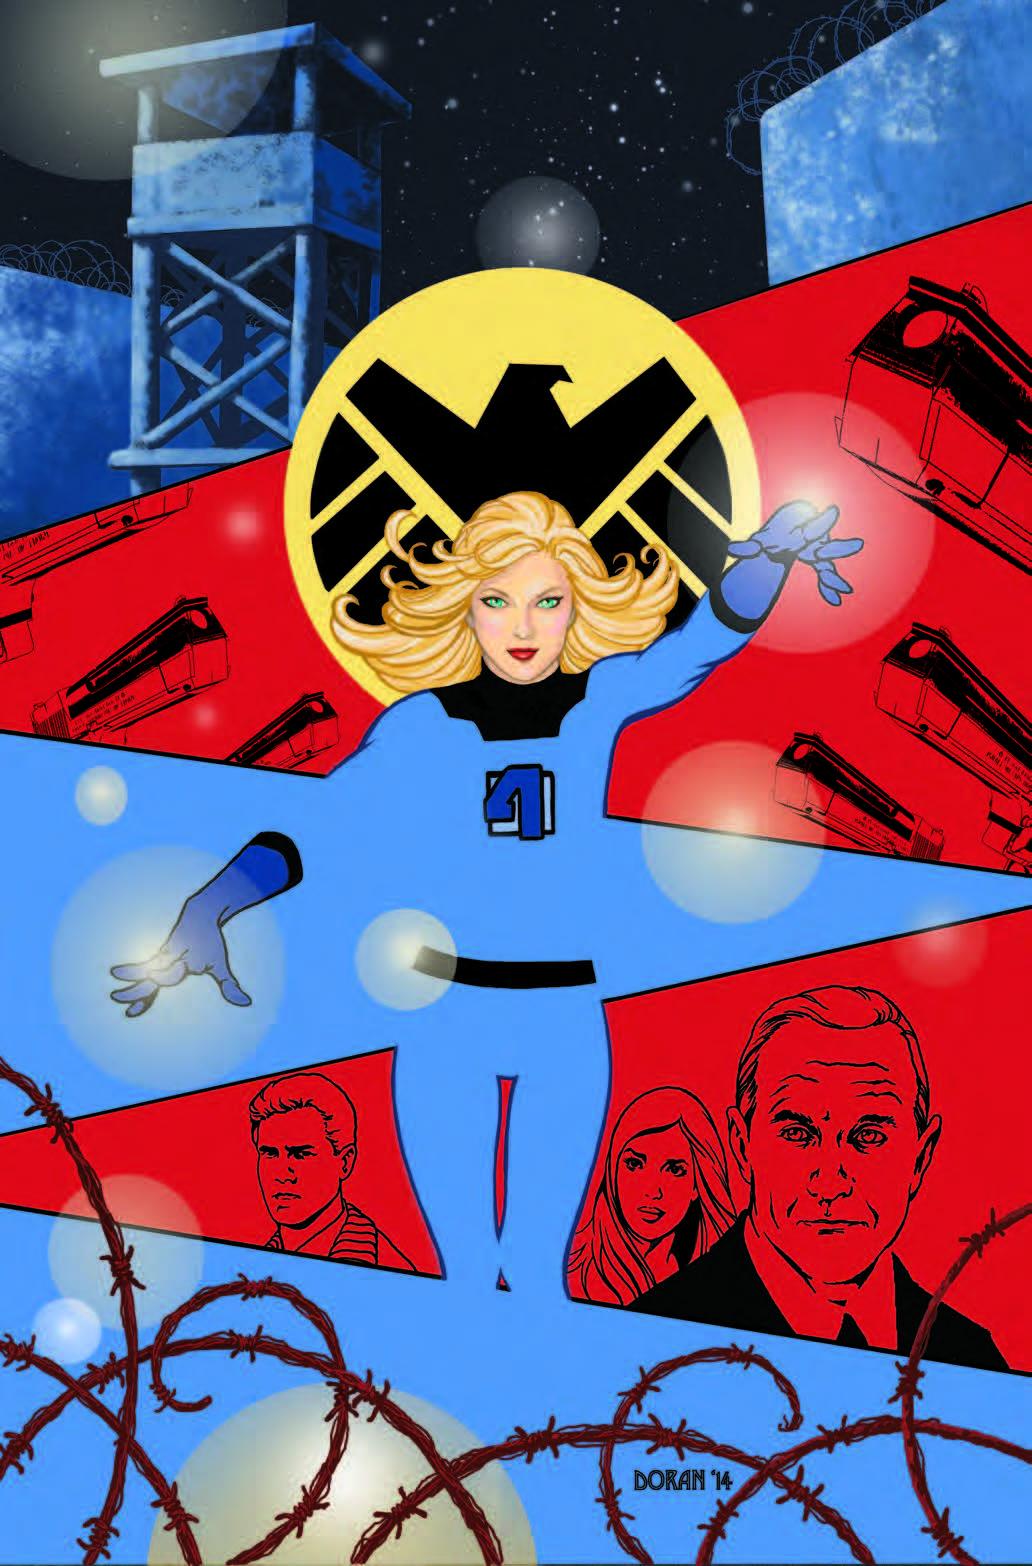 S.H.I.E.L.D. #4 by Colleen Doran